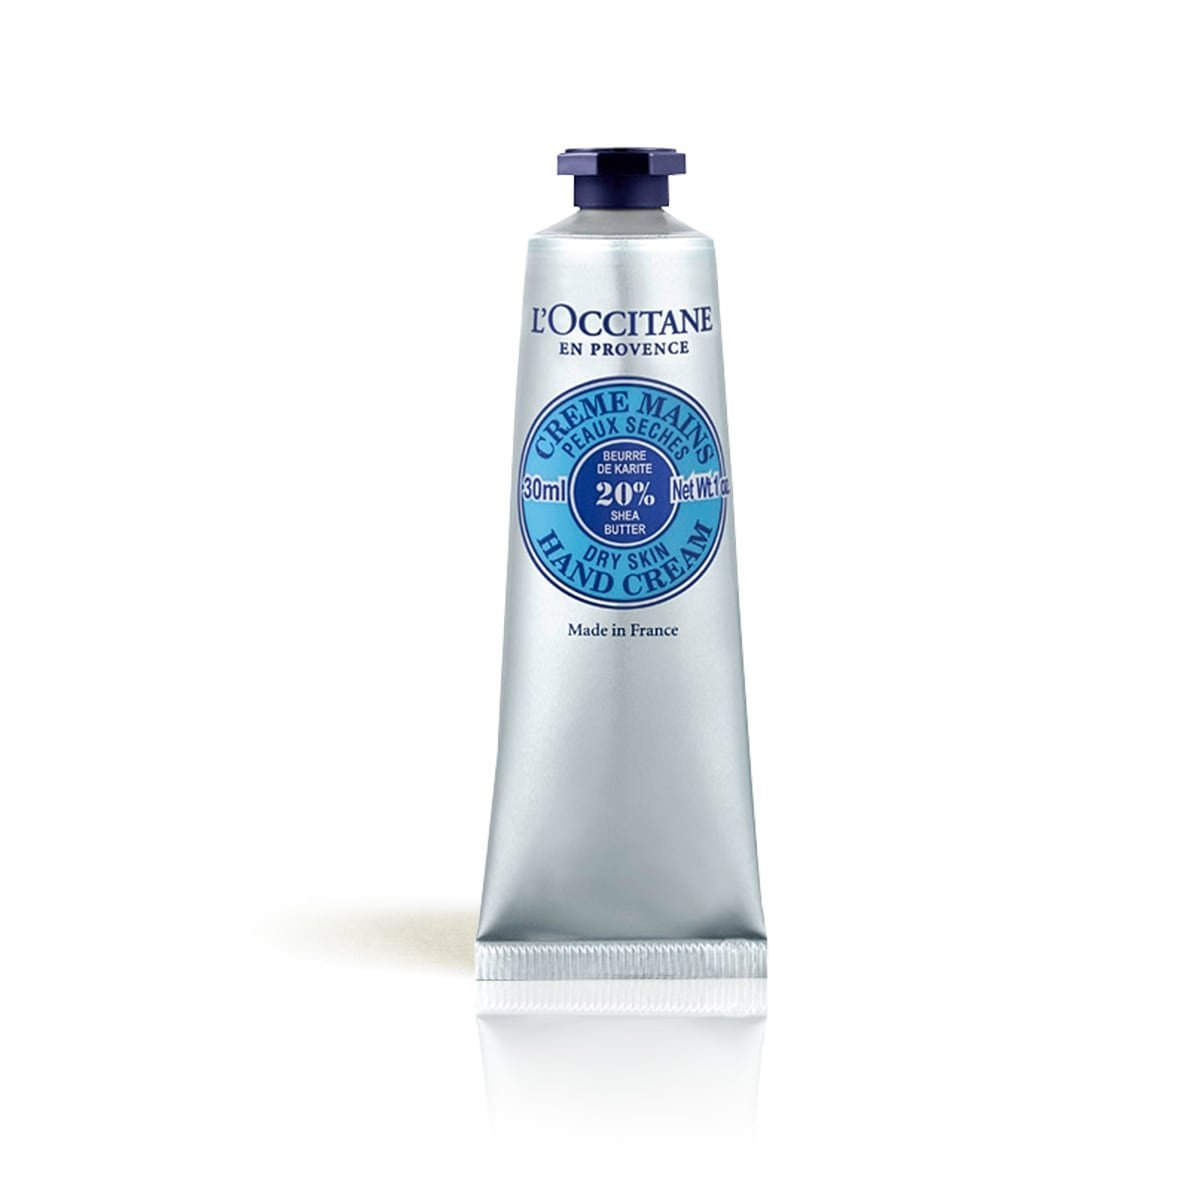 L'Occitane Fast-Absorbing 20% Shea Butter Hand Cream, 1 oz.